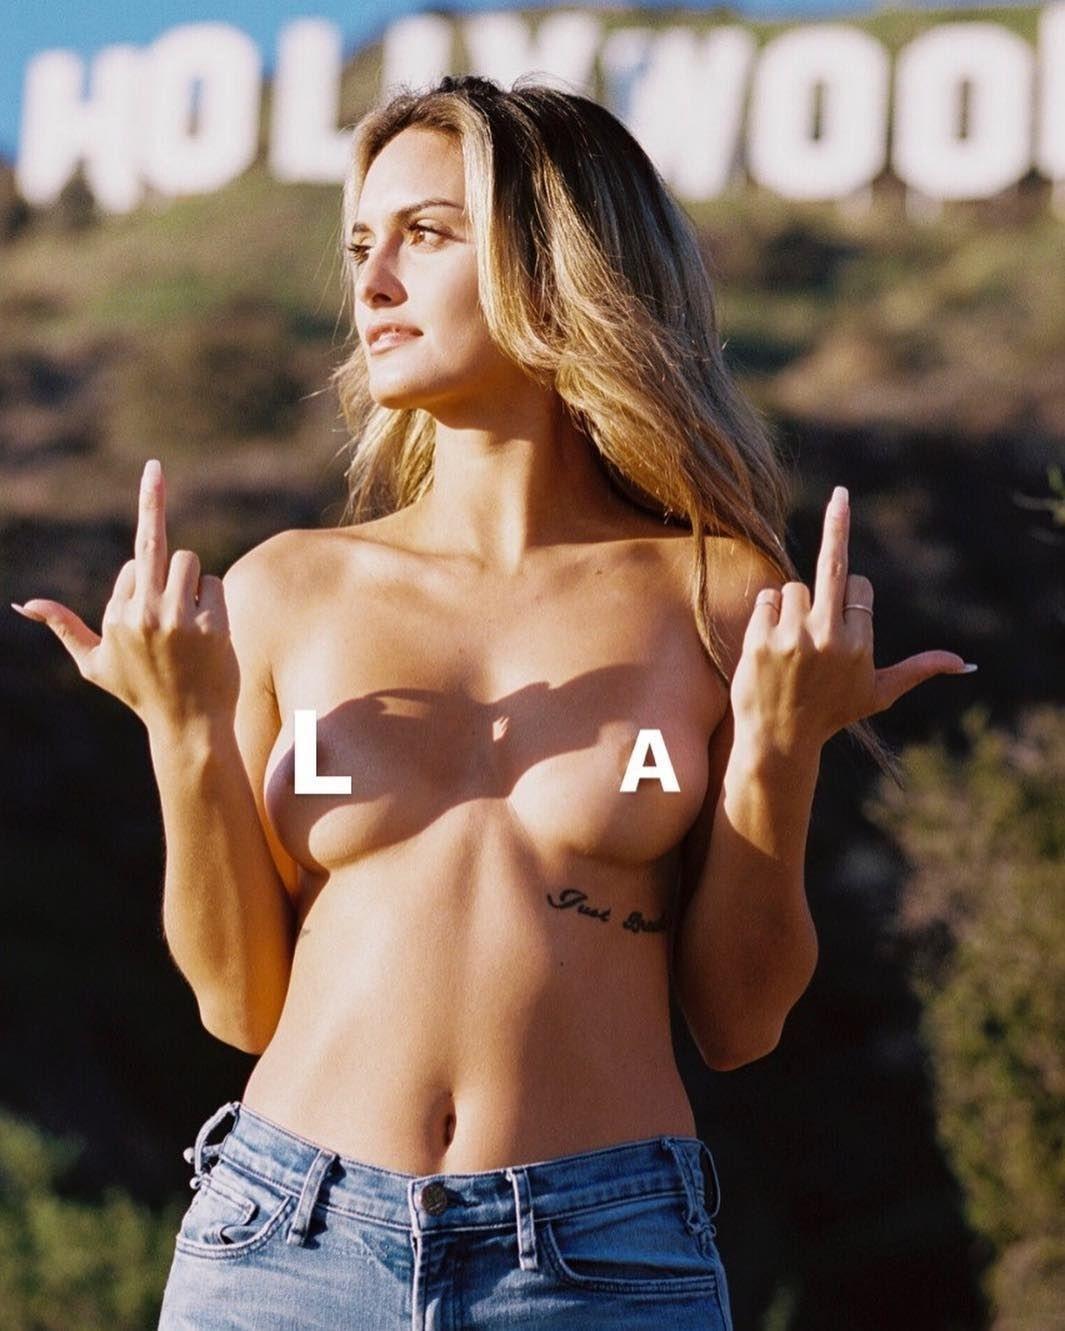 Pinwhat Men Want On Women | Bikini Models, Super Bowl, Women with regard to Julia Rose Super Bowl